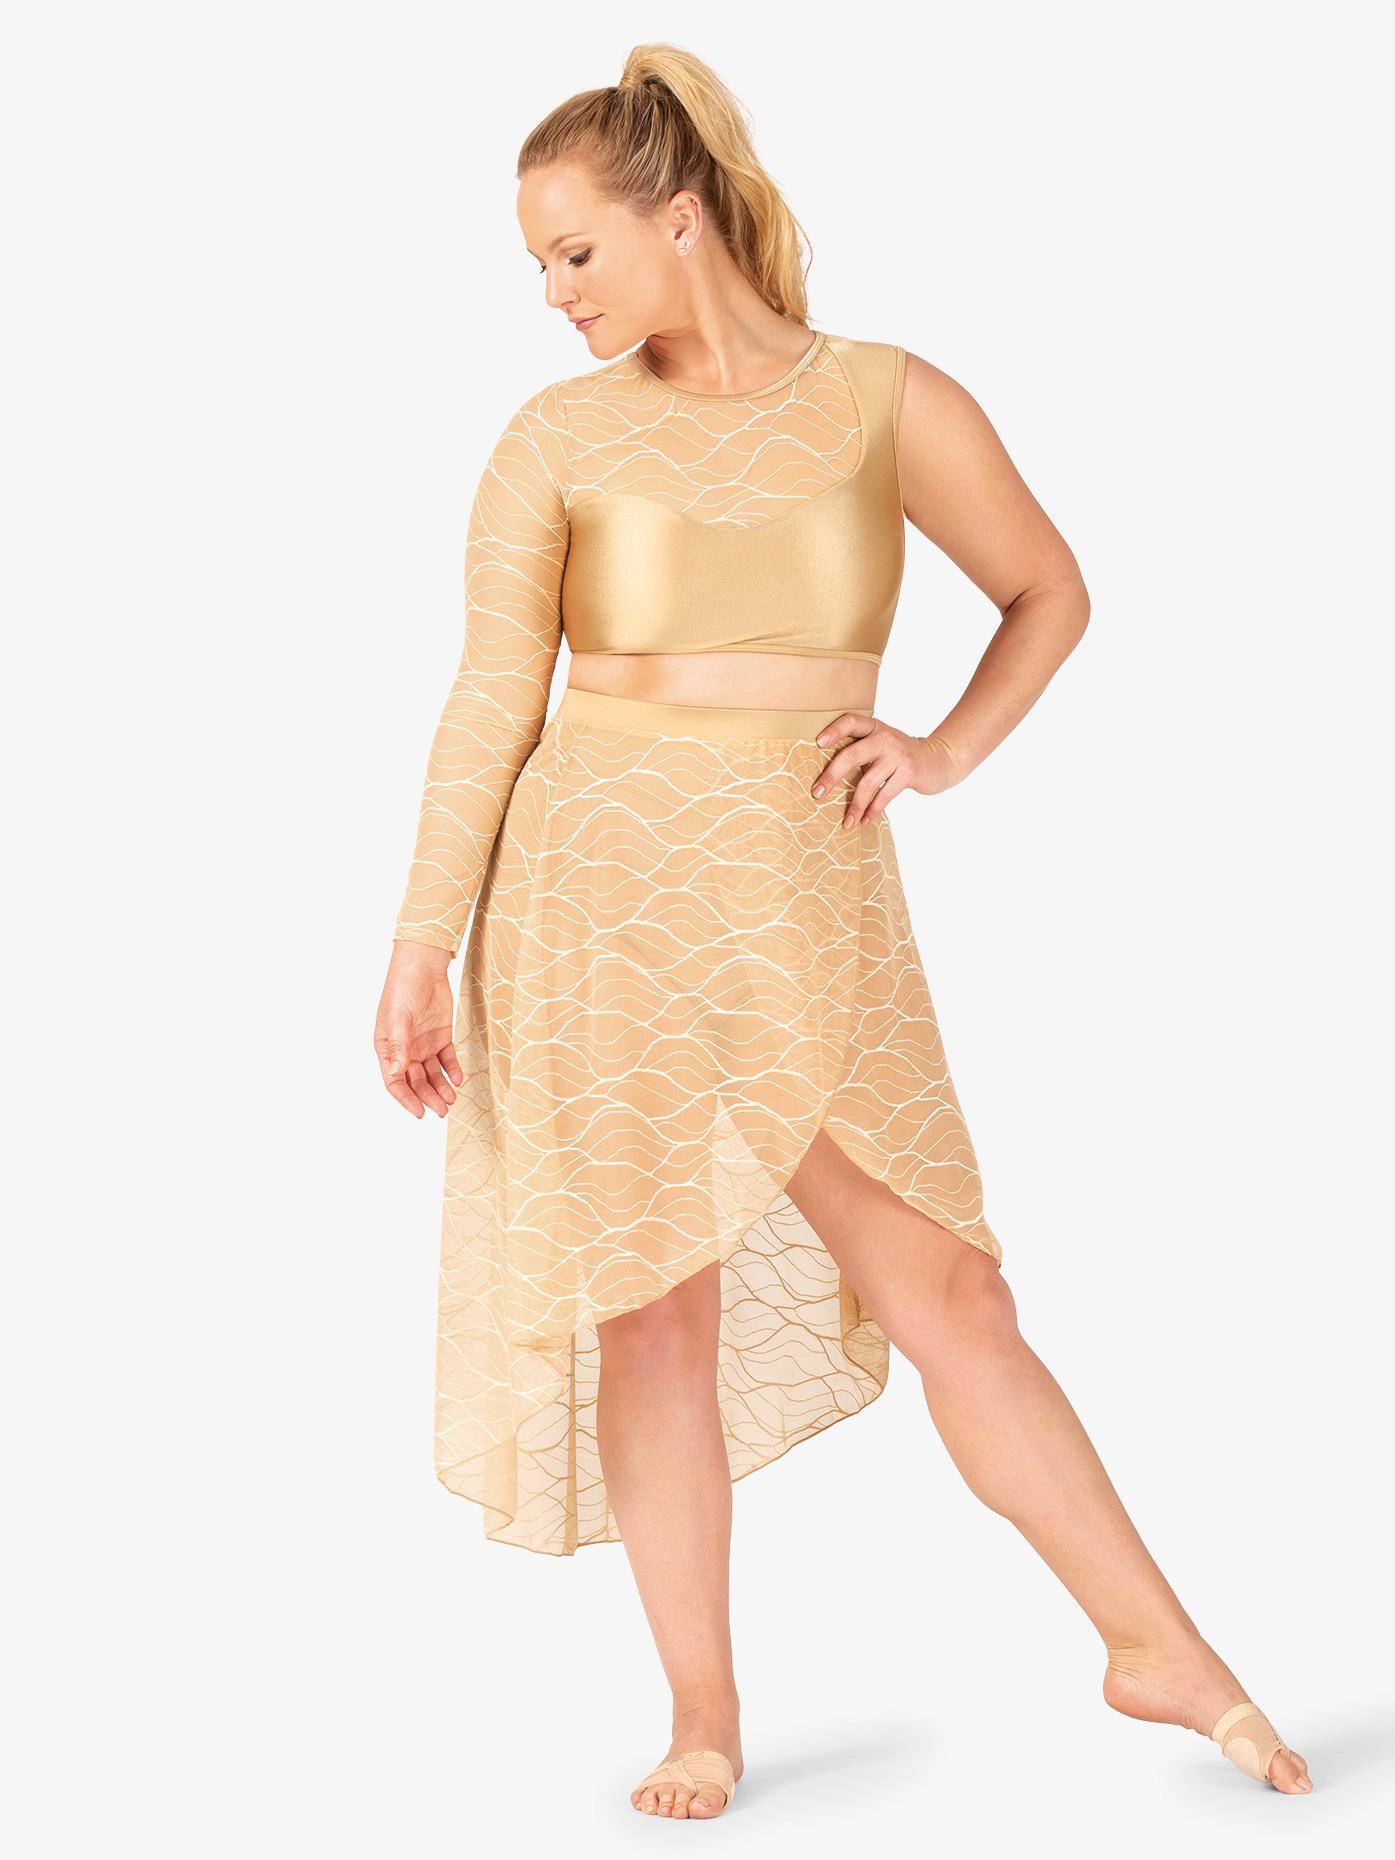 Double Platinum Womens Plus Size Swirl Mesh Long High-Low Performance Skirt N7630P